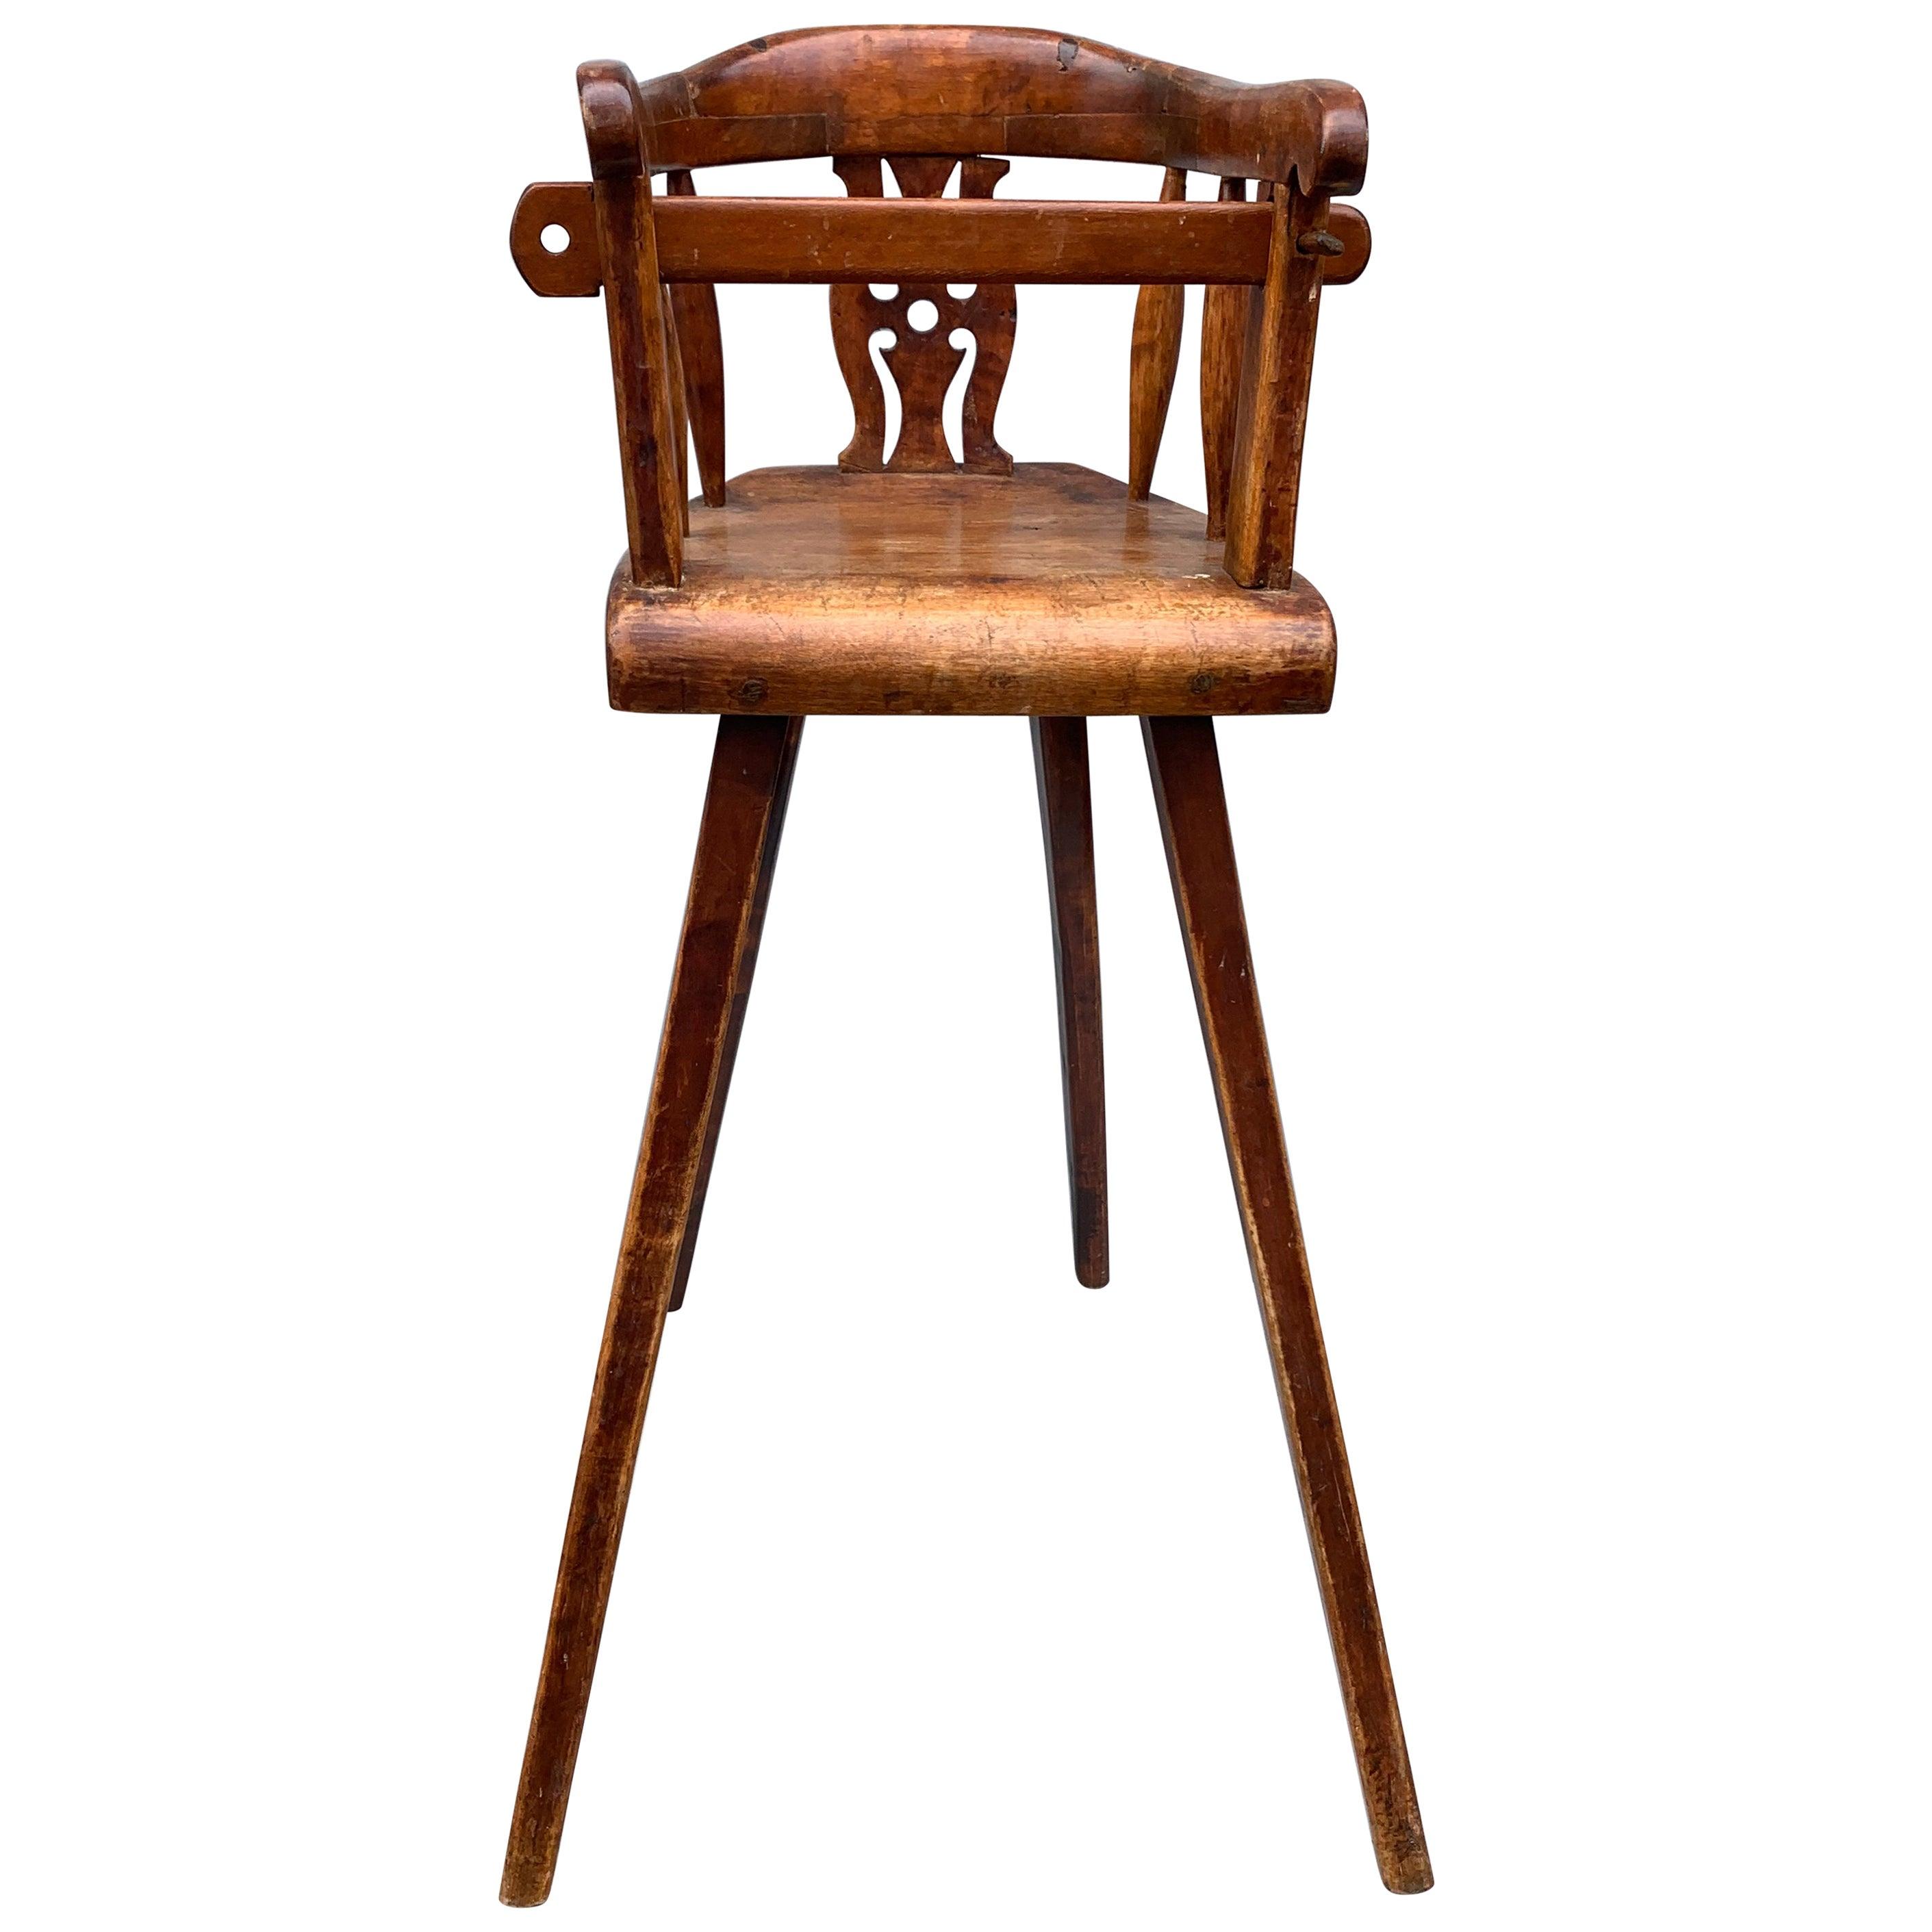 Swedish 19th Century Wooden Child's High Chair